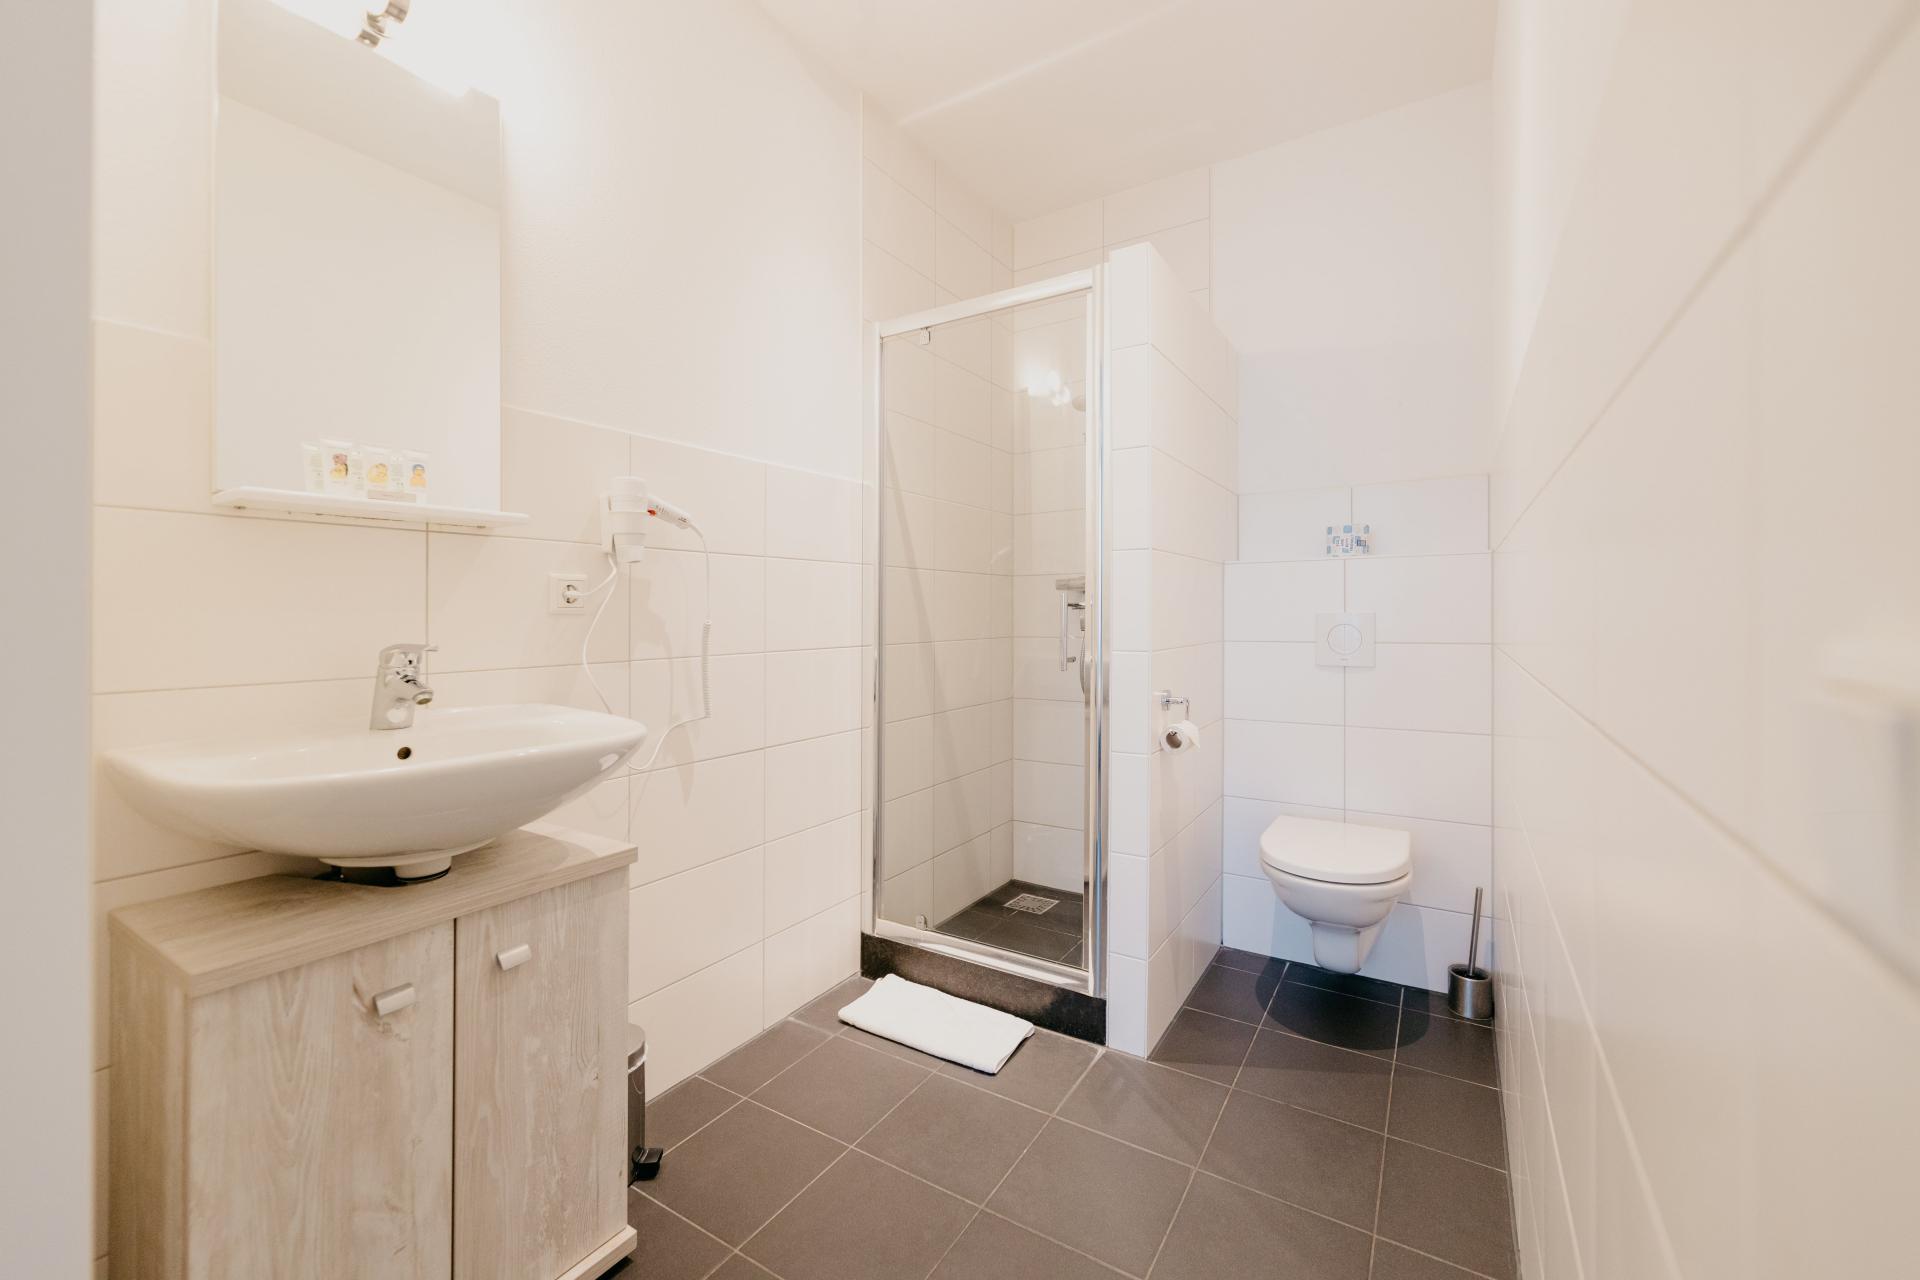 Bathroom at Amsterdam ID Aparthotel, Sloterdijk, Amsterdam